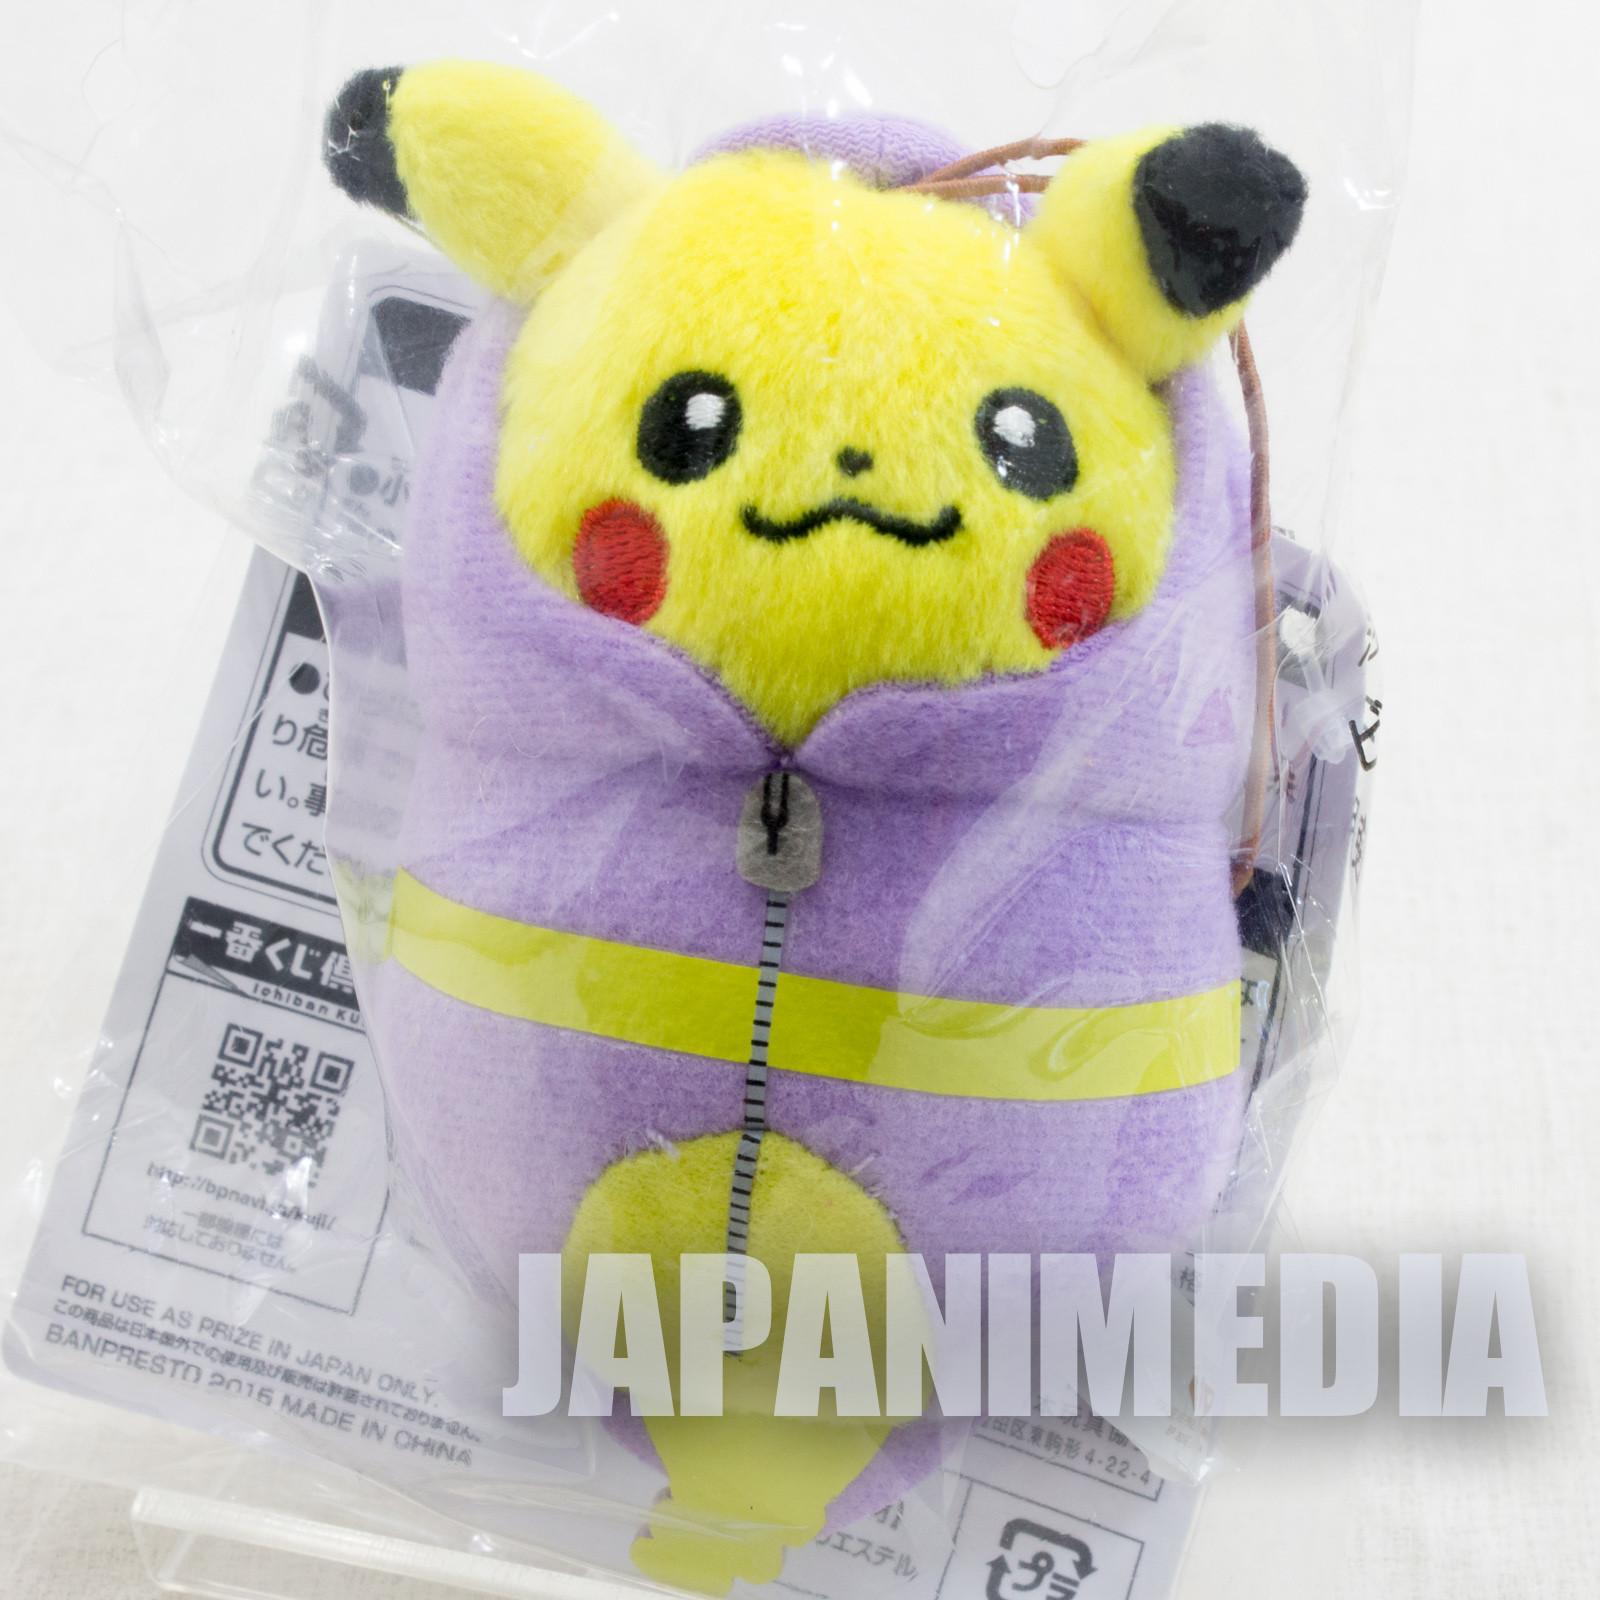 Pokemon Pikachu in Sleeping Bag Plush Doll Mascot Strap #3 JAPAN ANIME